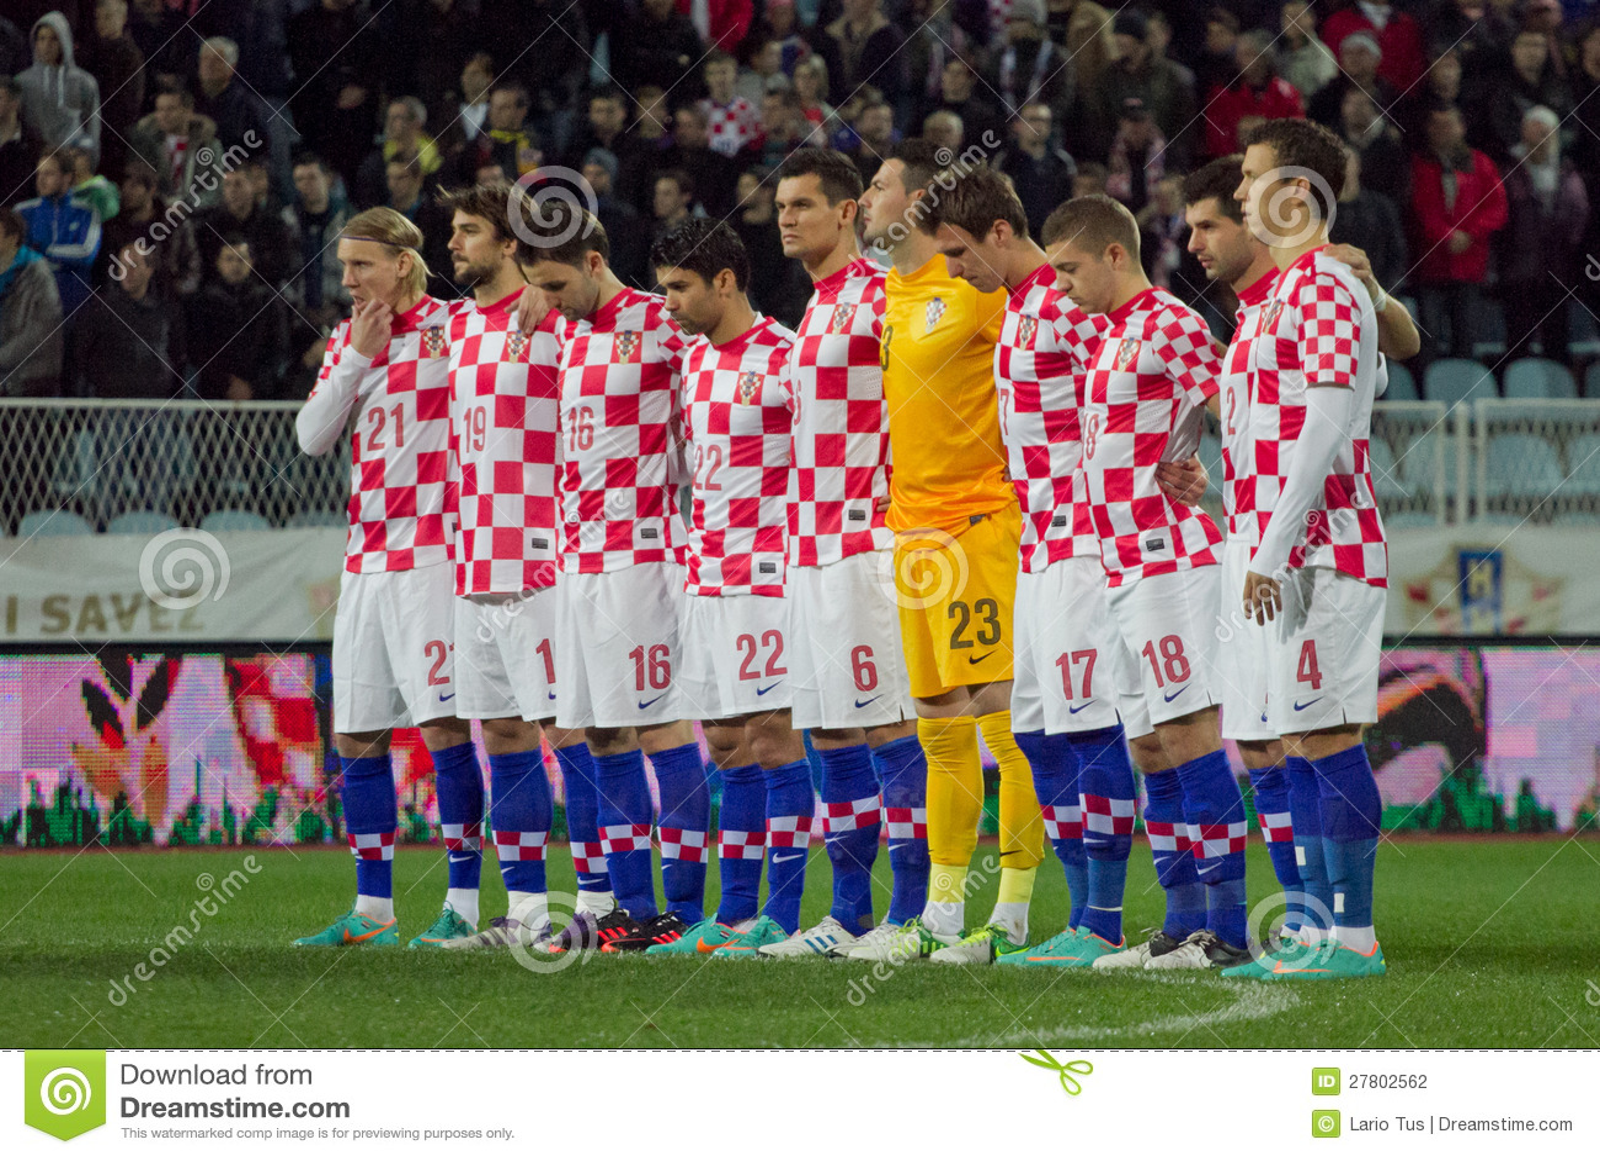 5d27786e8 RIJEKA, CROATIA - NOV, 14: soccer match between Croatia national football  team and Selection of HNL on Novemeber 14, 2012 in Rijeka, Croatia